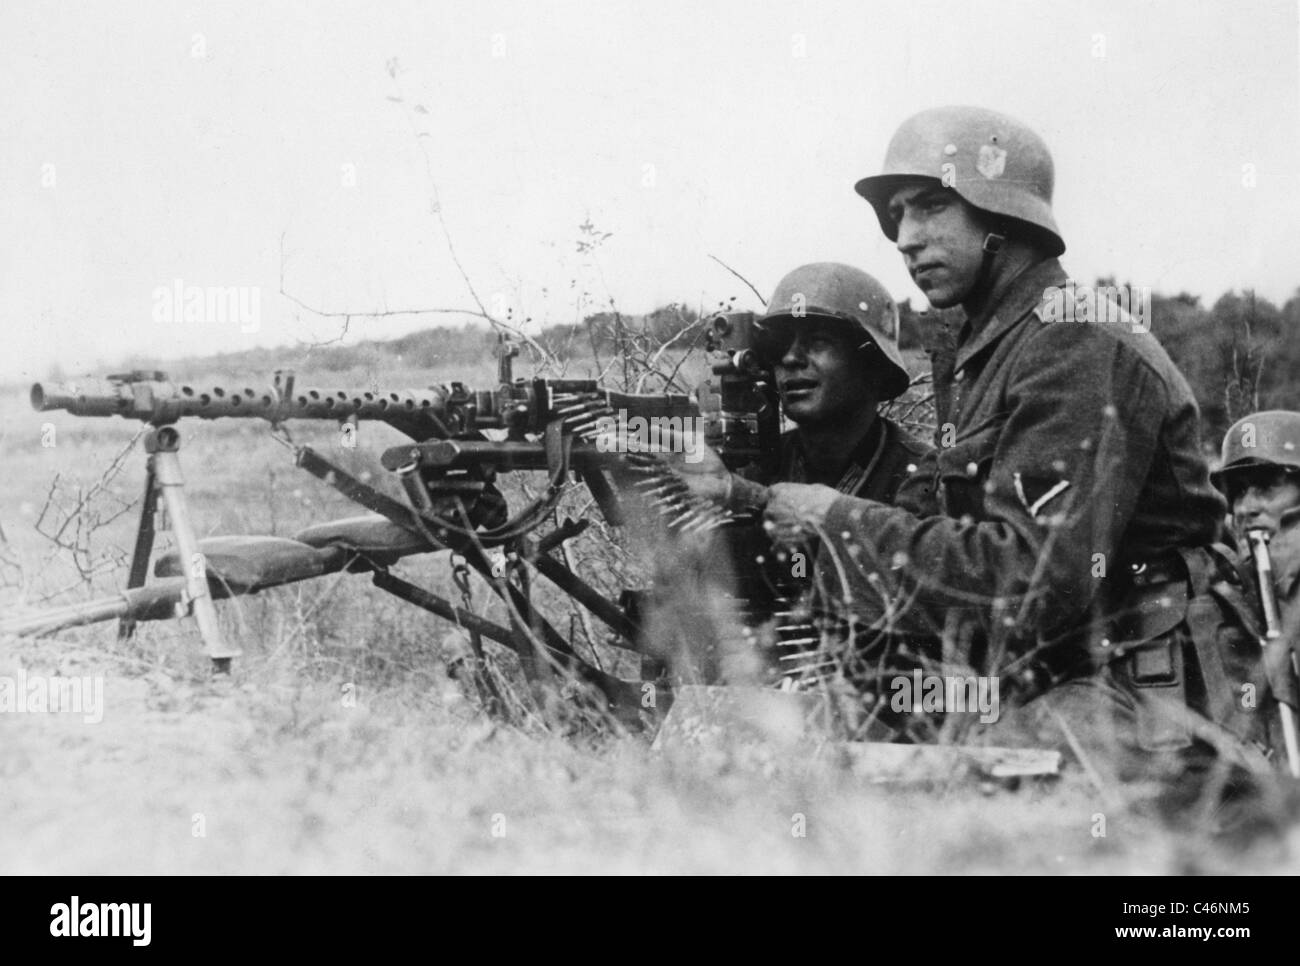 Second World War: The German Wehrmacht on Crimea 1941 - 1942 - Feodosiya, Simferopol, Kerch - Stock Image